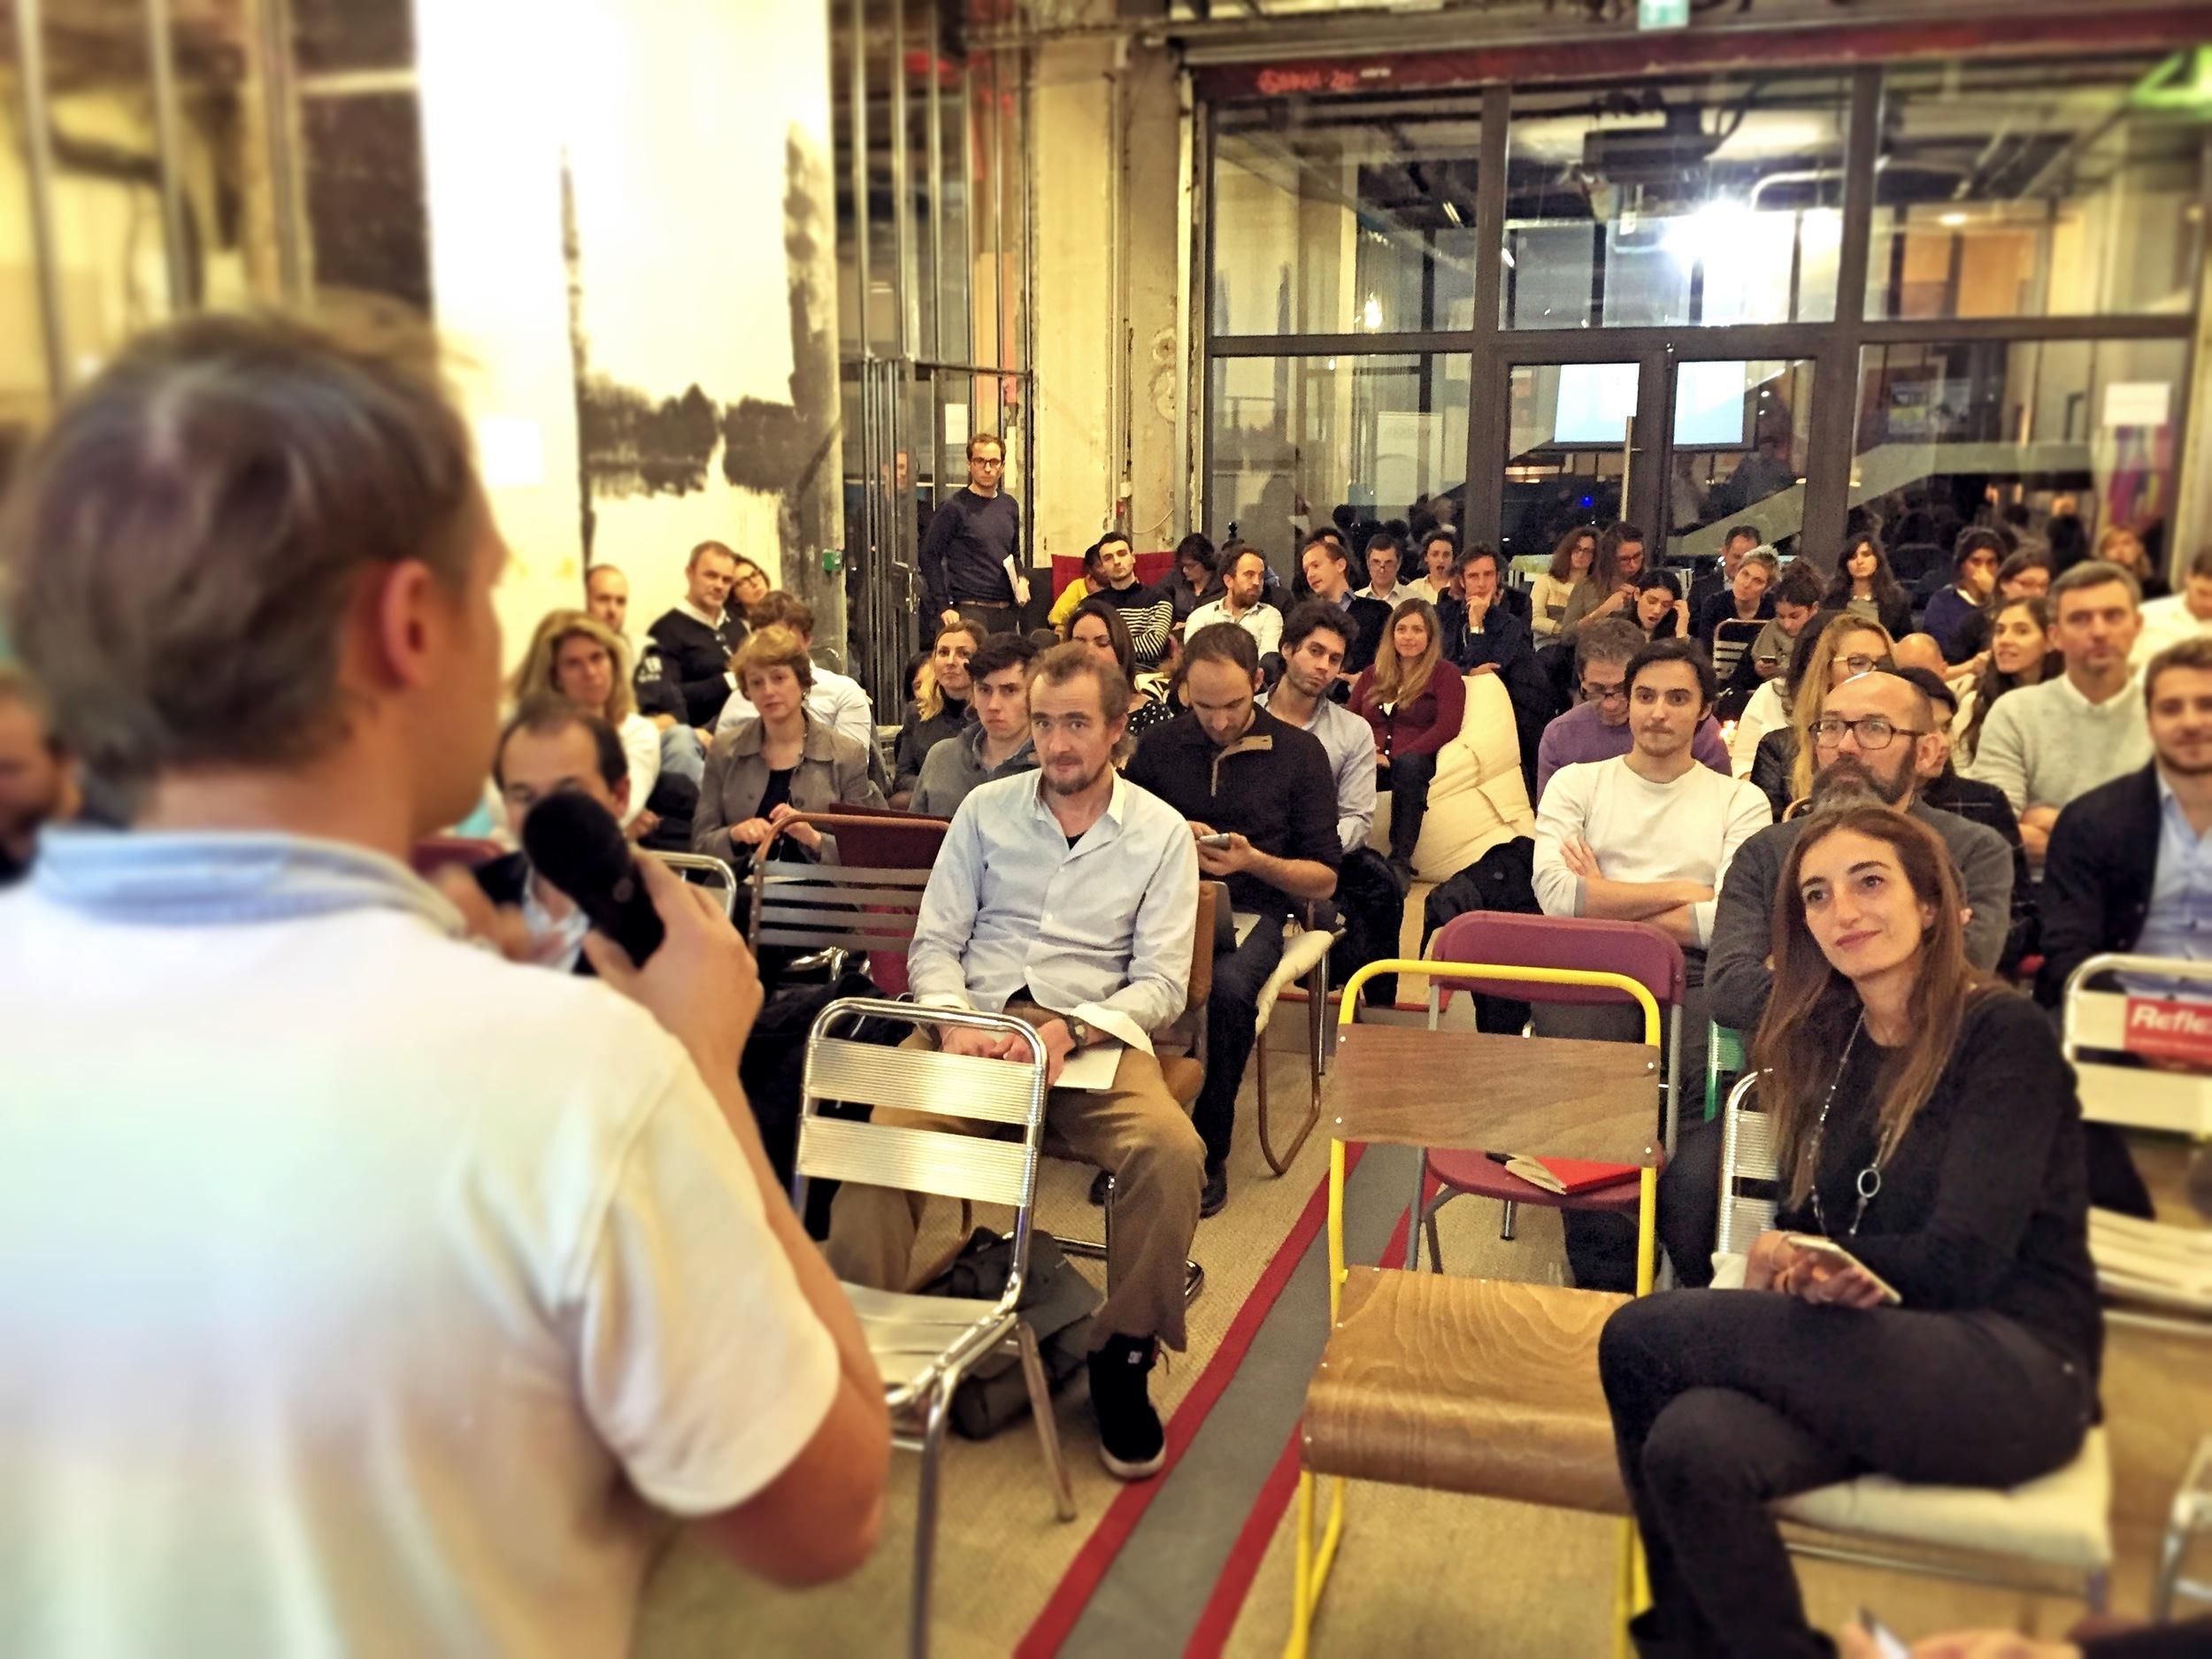 startups-calling-stringcan-interactive-remix-coworking-paris-7.jpg